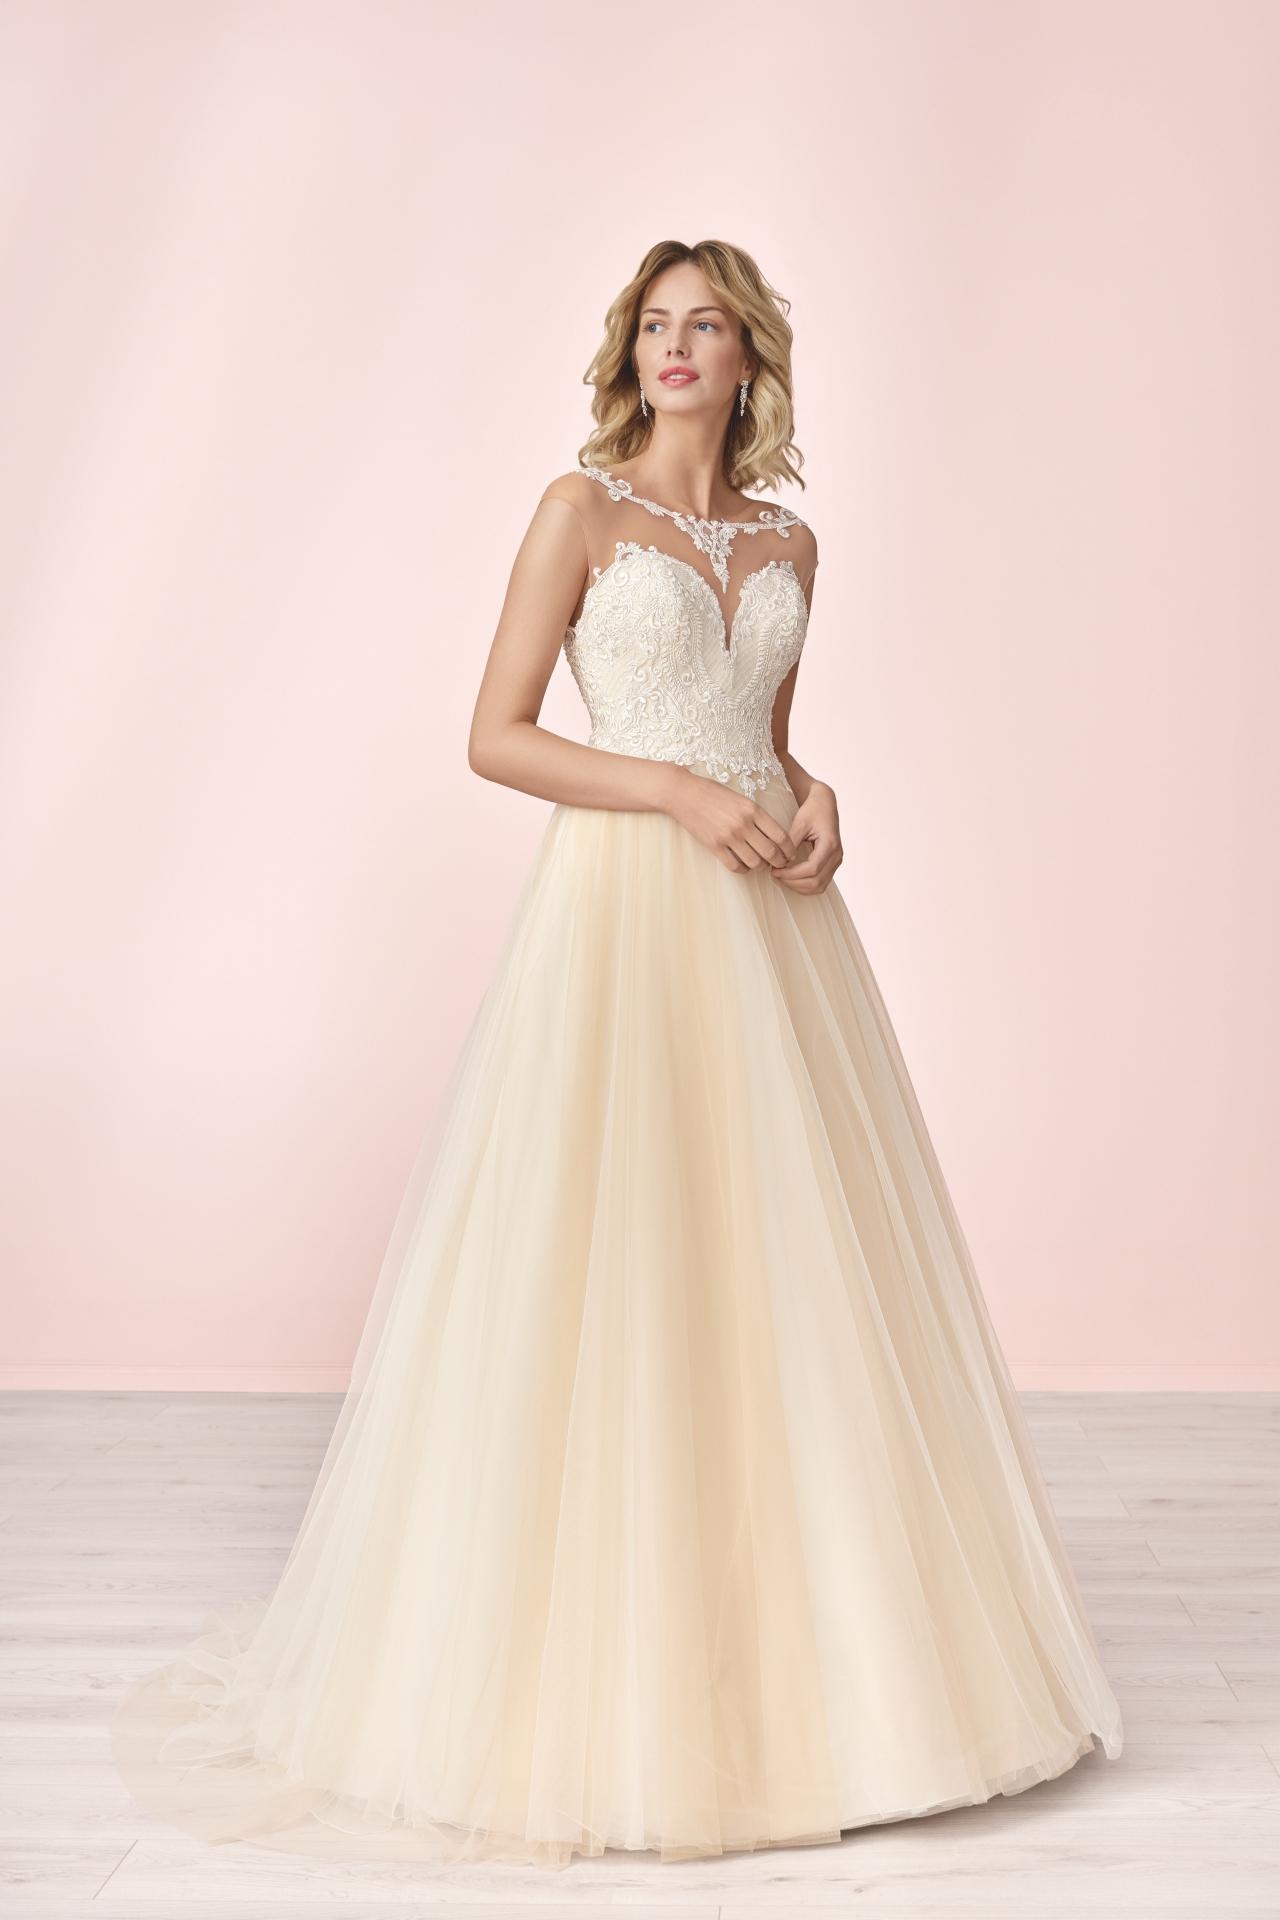 Brautkleid Elizabeth Konin 2019 - 4129T-1